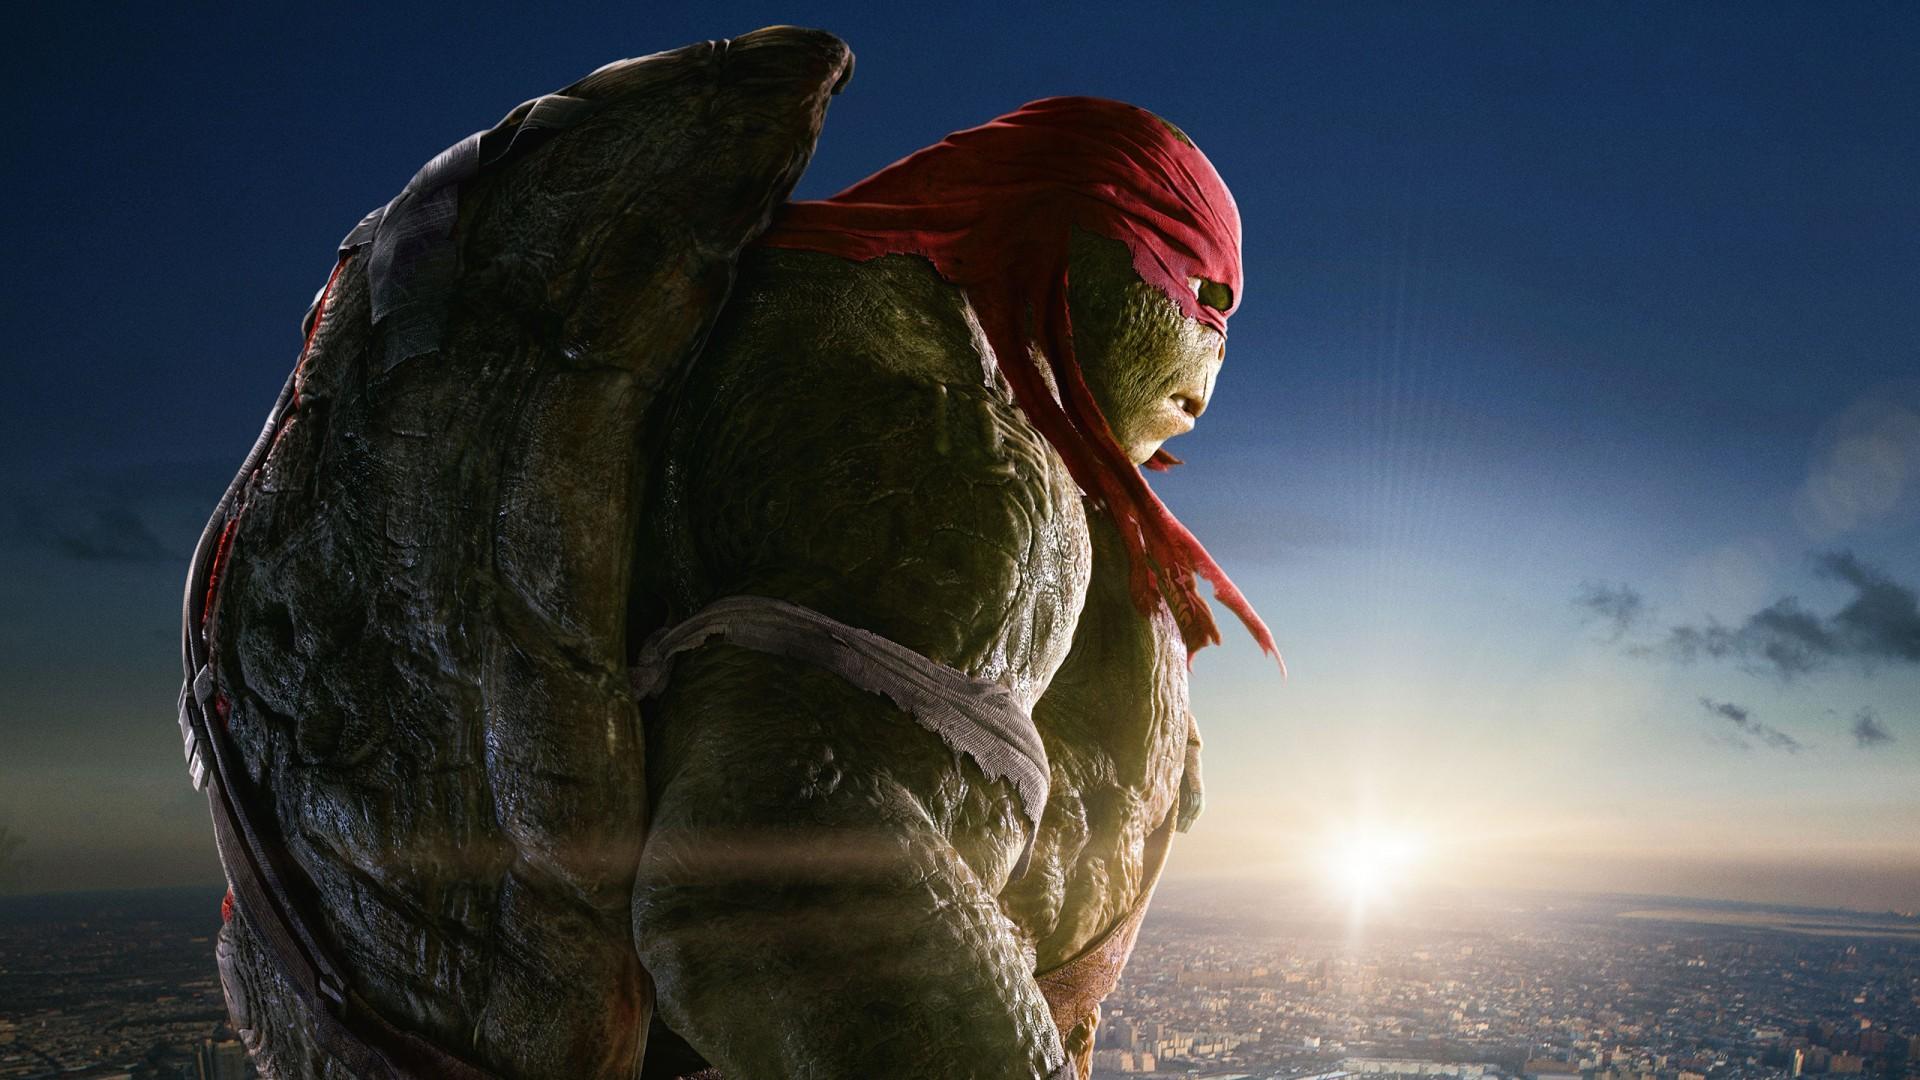 Ninja 3d Wallpaper Raphael In Teenage Mutant Ninja Turtles Wallpapers Hd